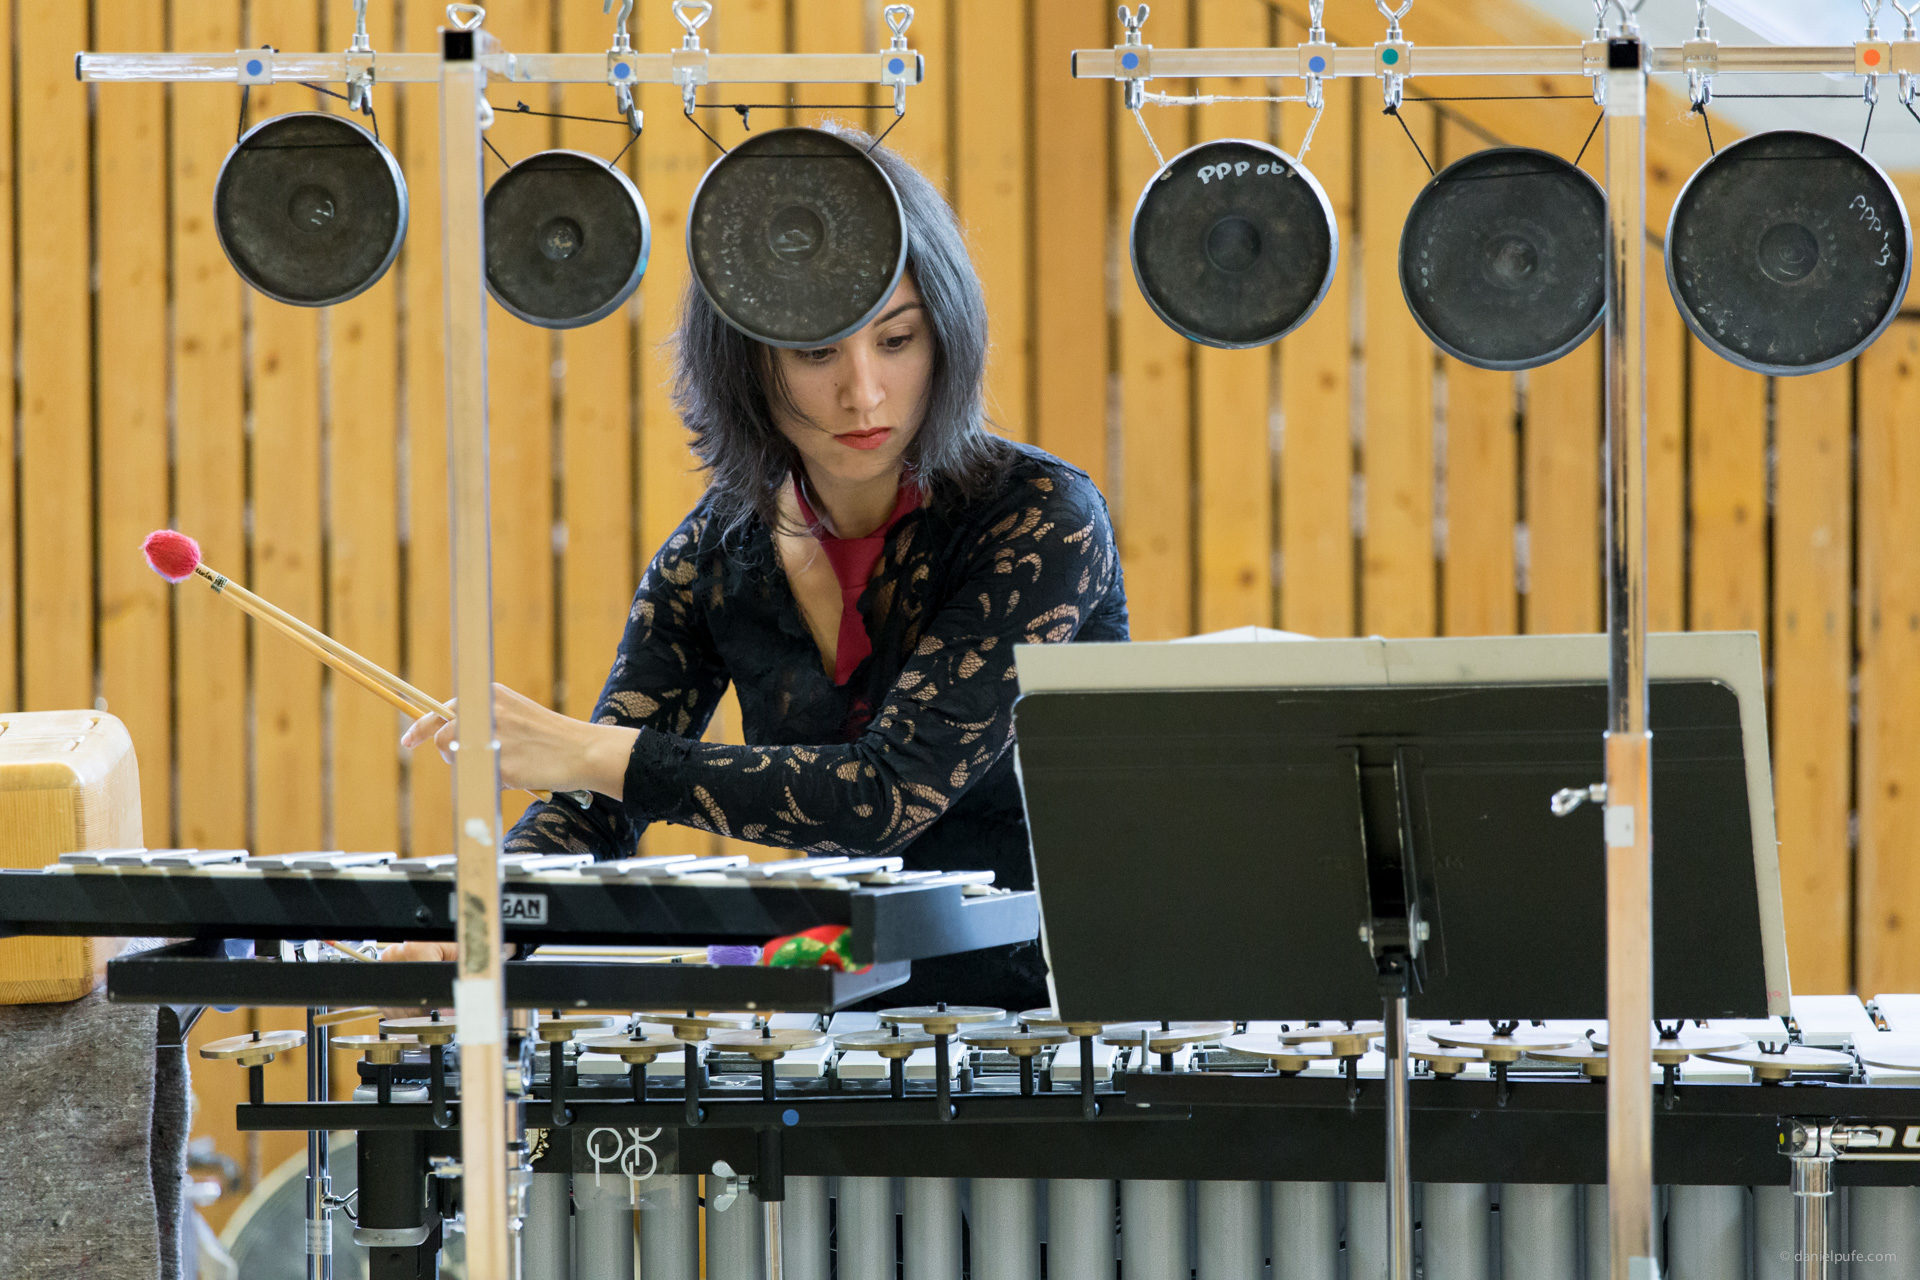 Konzert - Duo Tied - Edith Stein Schule